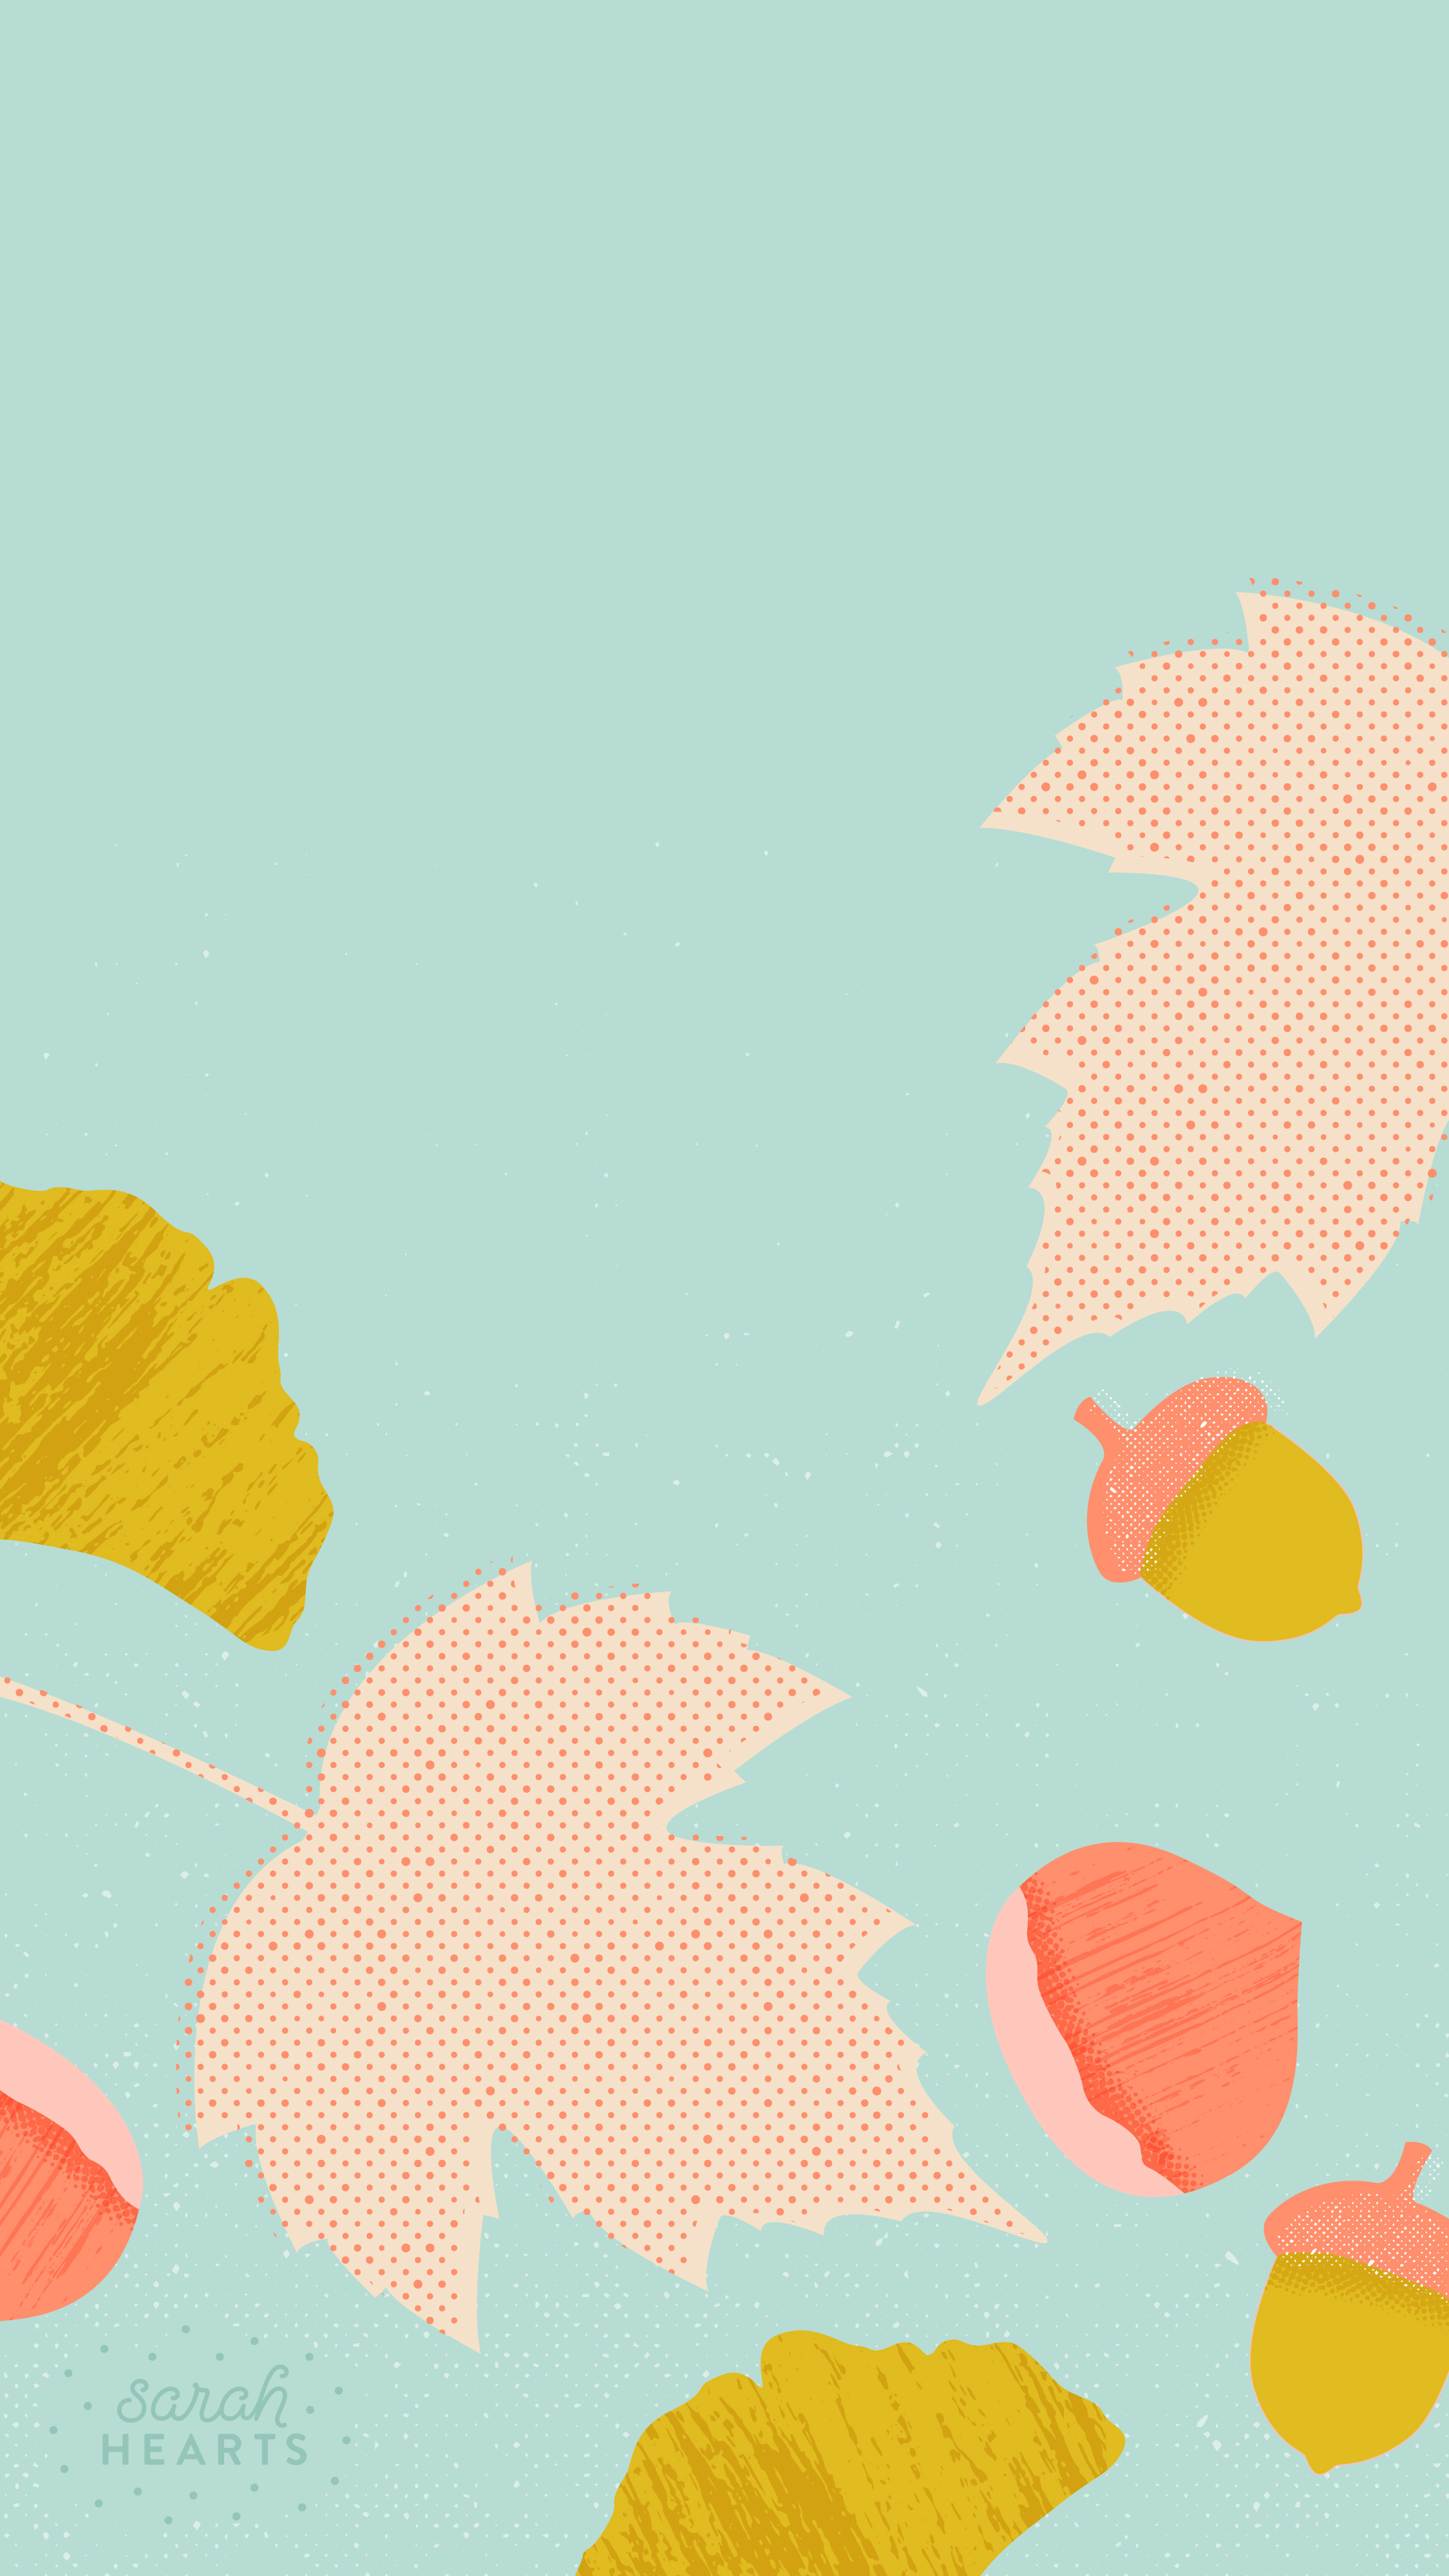 Cute Wallpapers Tumbkr October 2015 Calendar Wallpaper Sarah Hearts